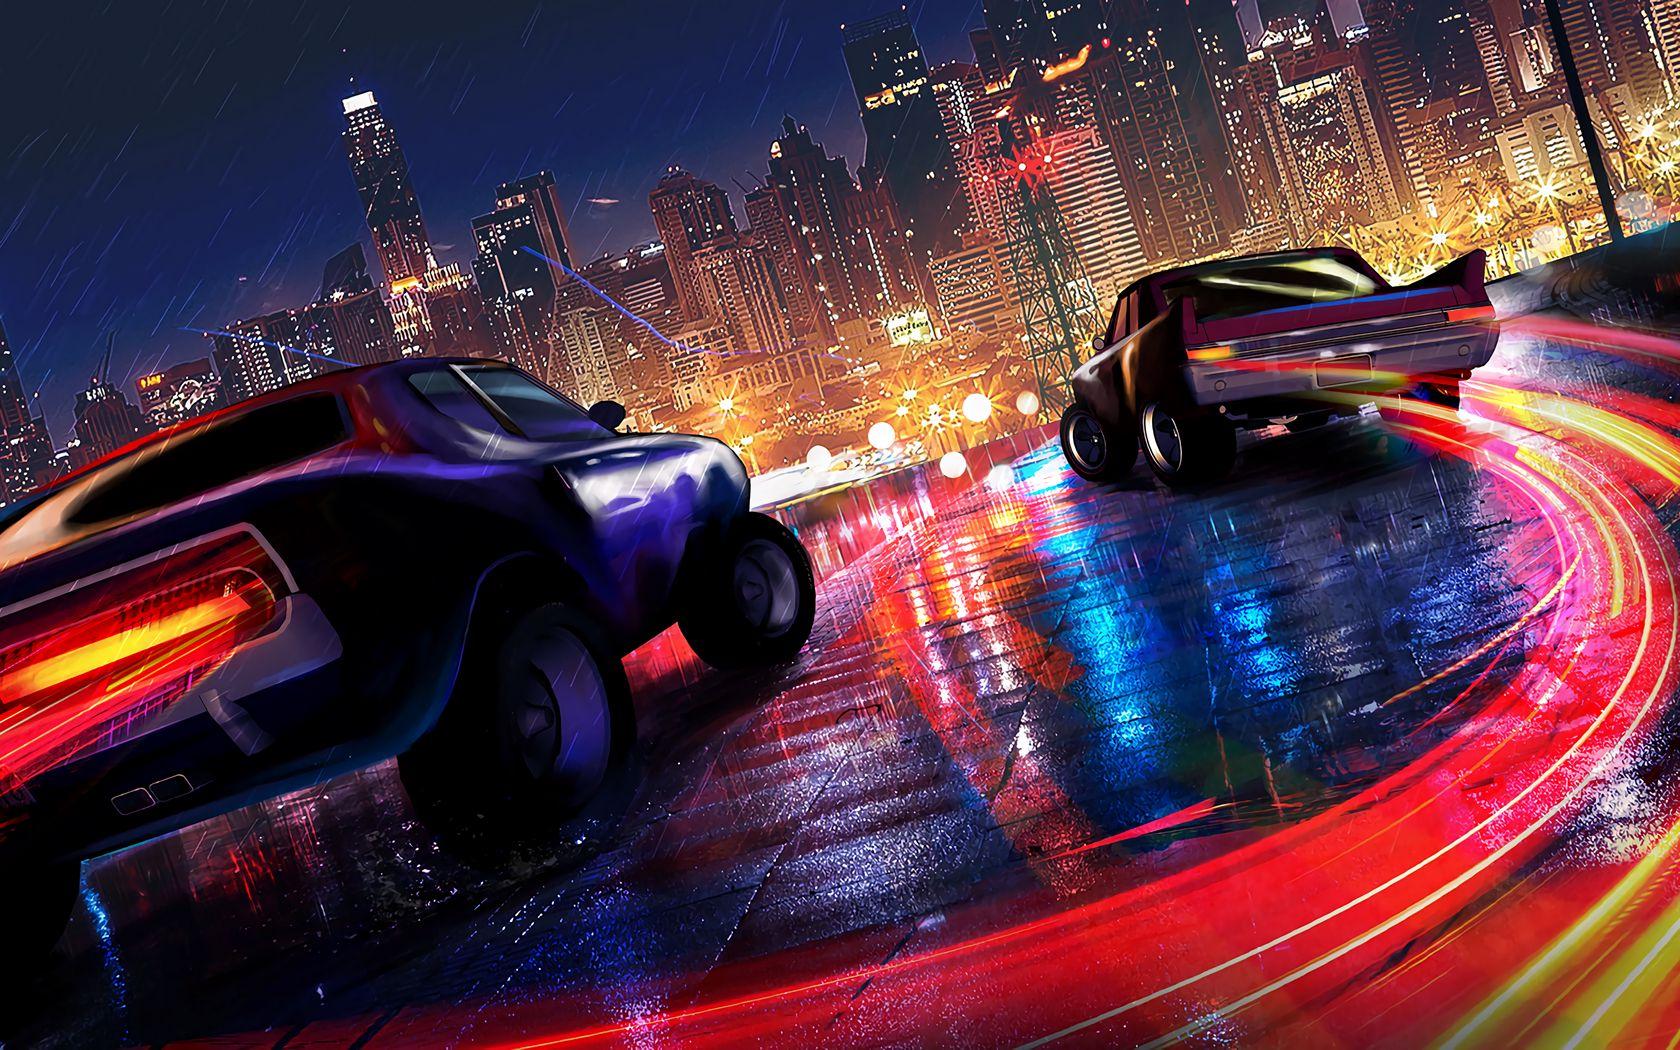 1680x1050 Wallpaper cars, lights, city, motion, rain, wet